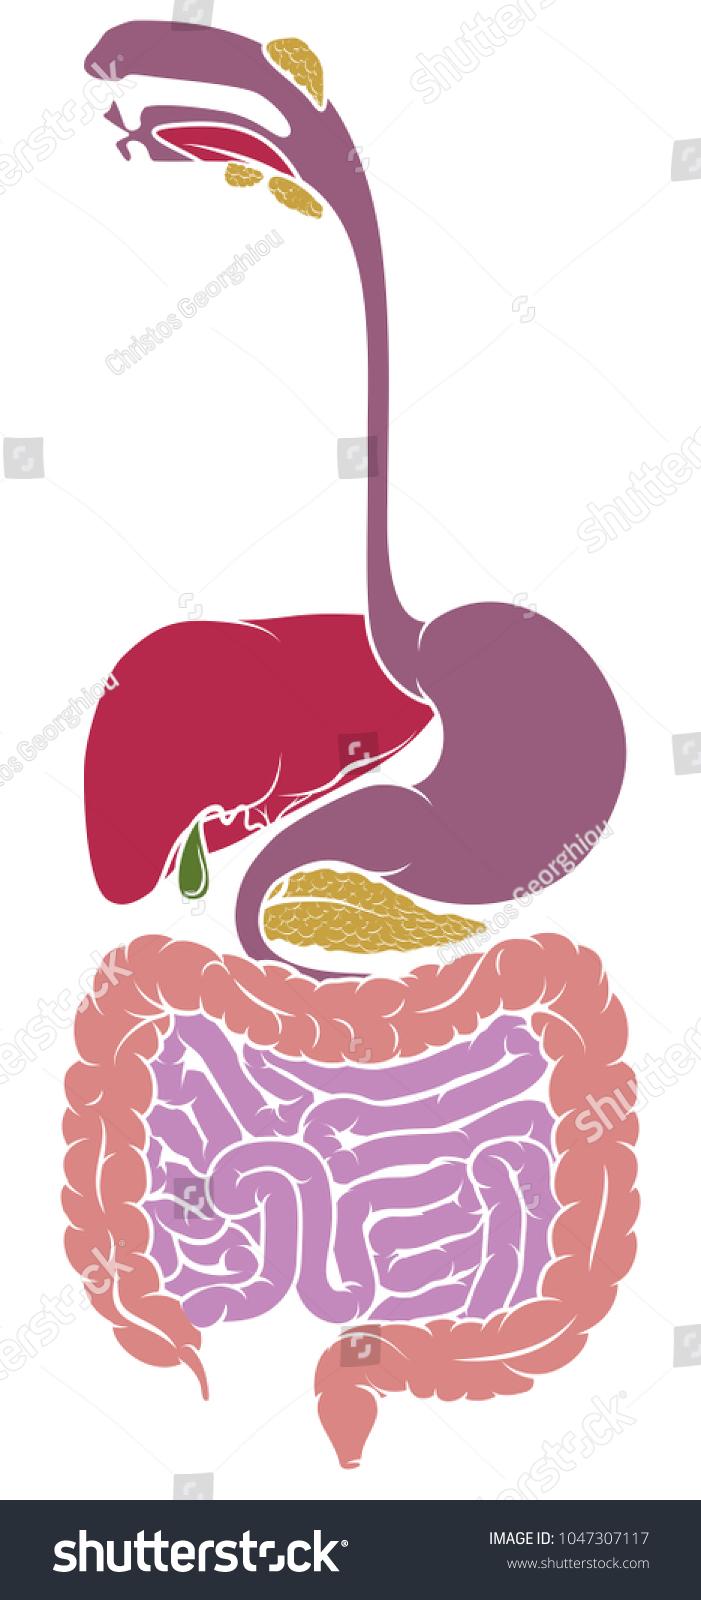 Human anatomy diagram gut gastrointestinal tract em ilustrao stock a human anatomy diagram of the gut gastrointestinal tract digestive system ccuart Image collections